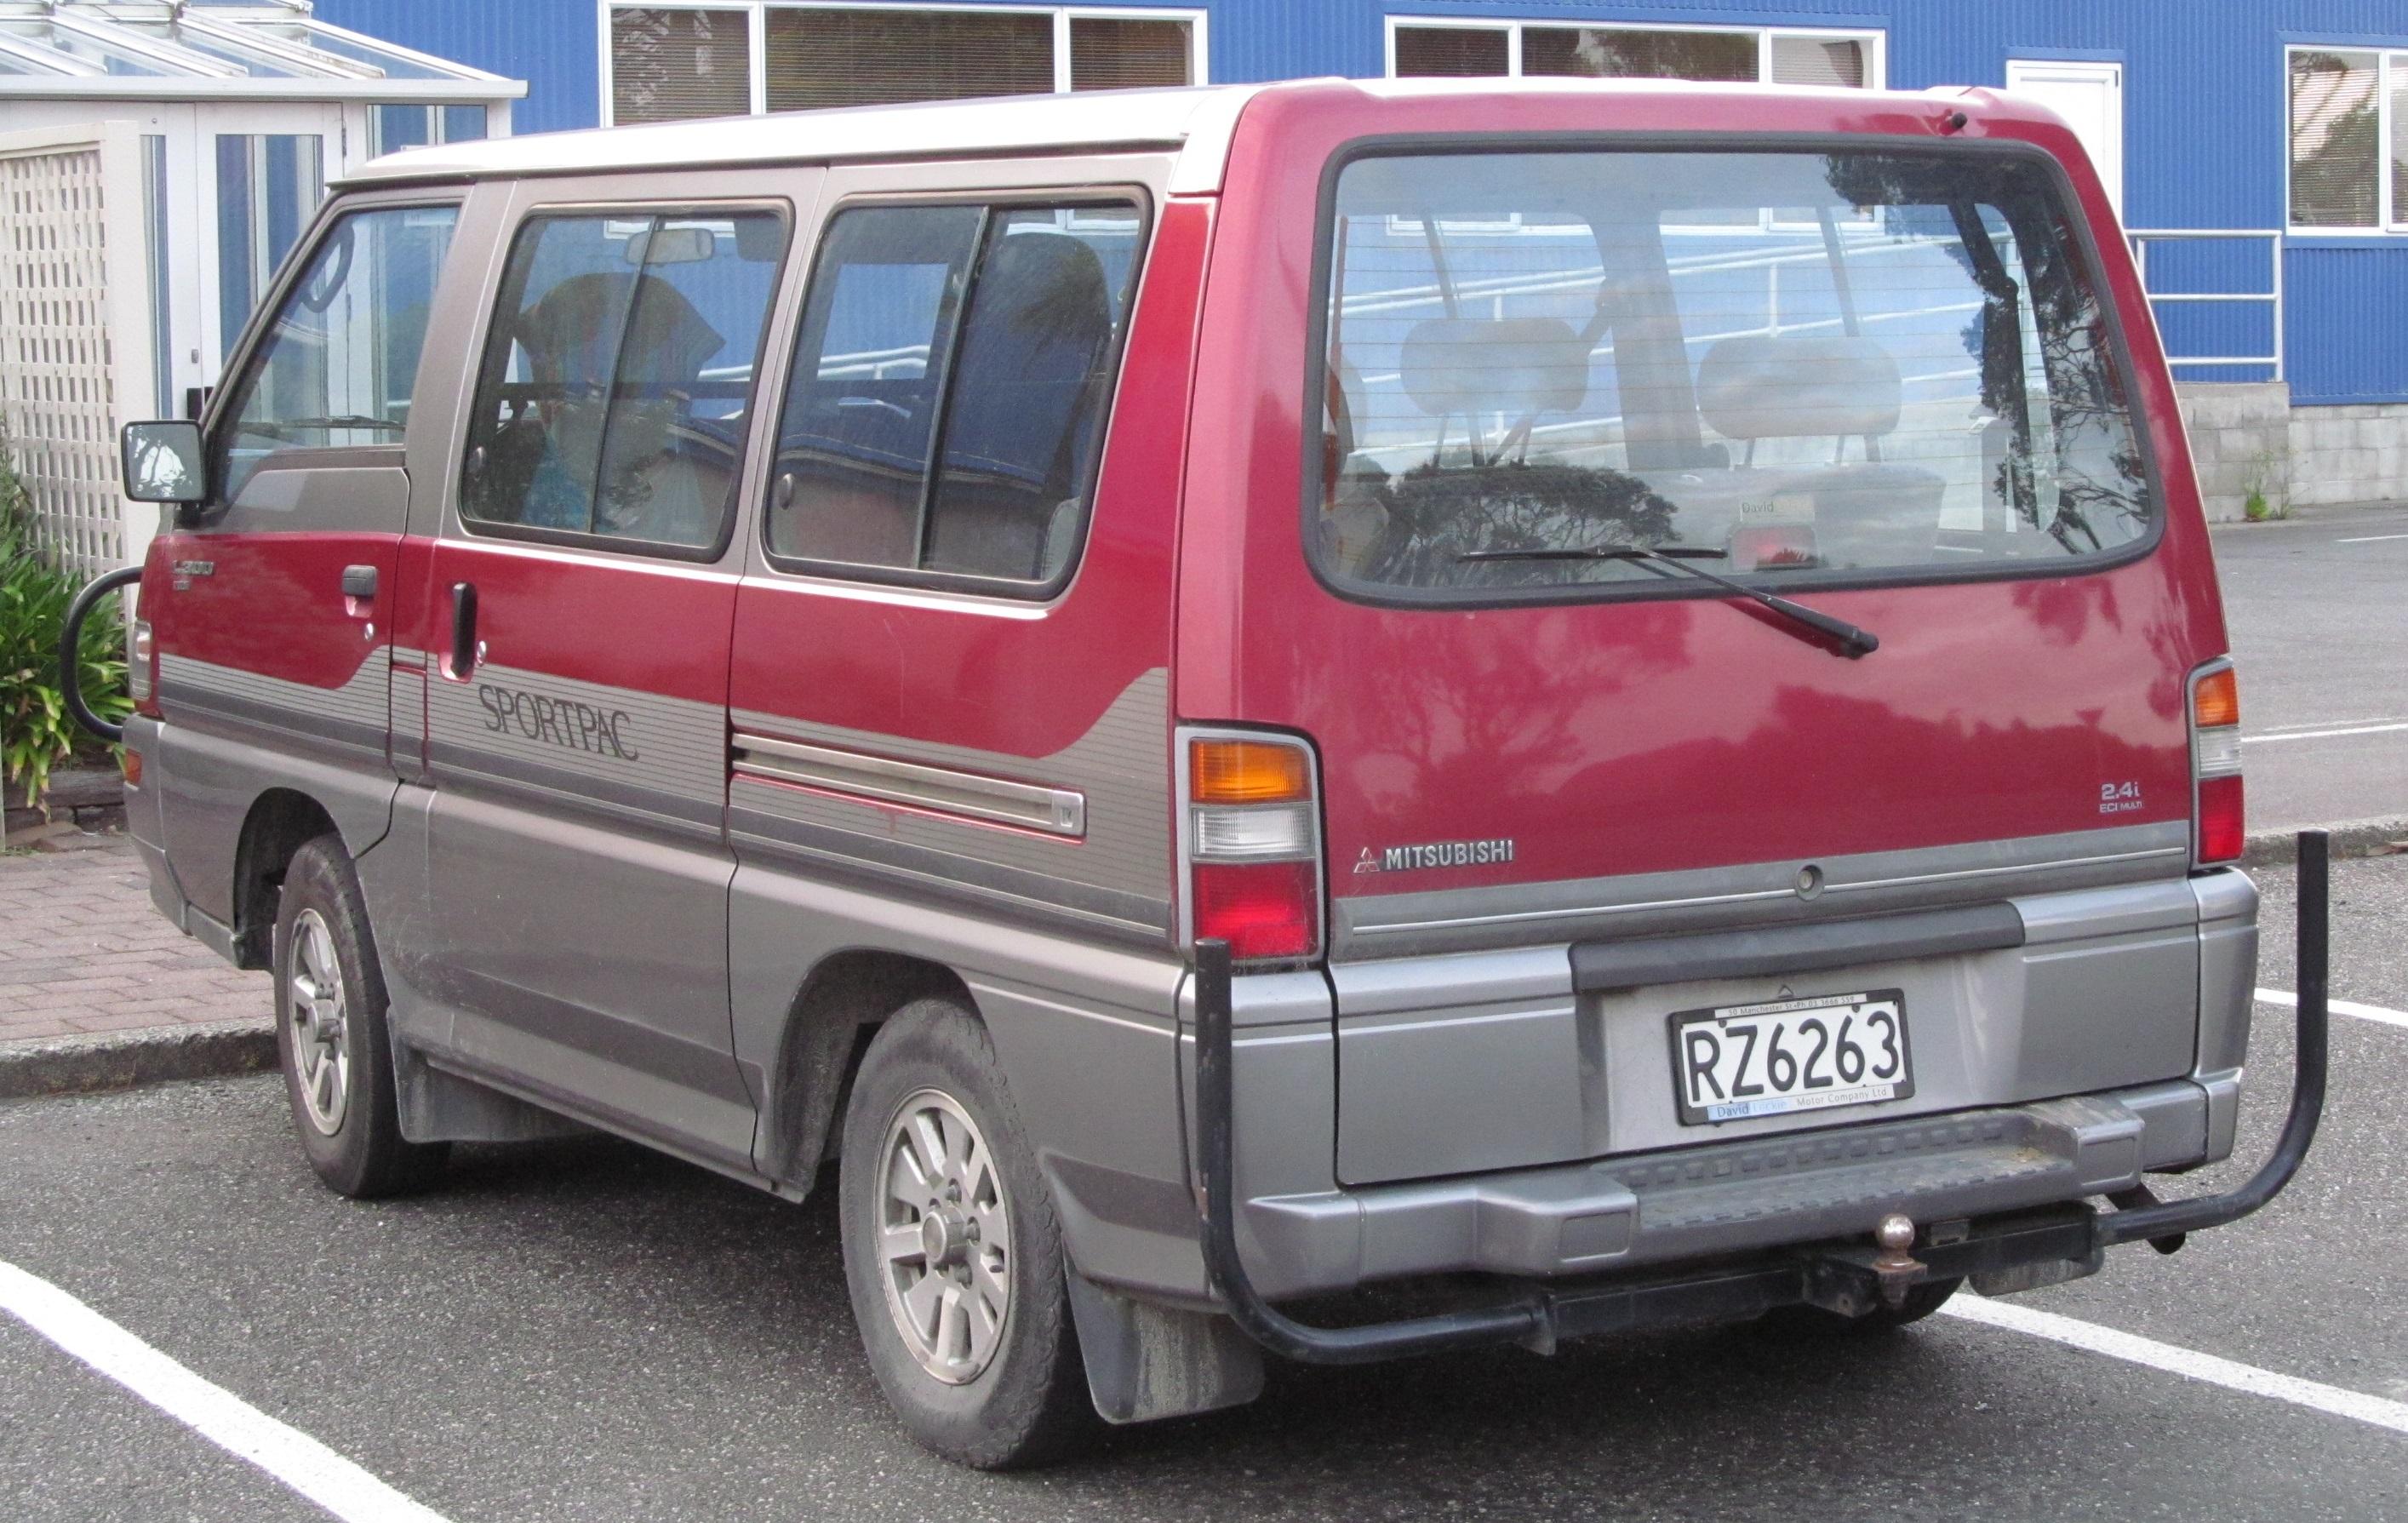 File:1993 Mitsubishi L300 Sportpac (New Zealand).jpg